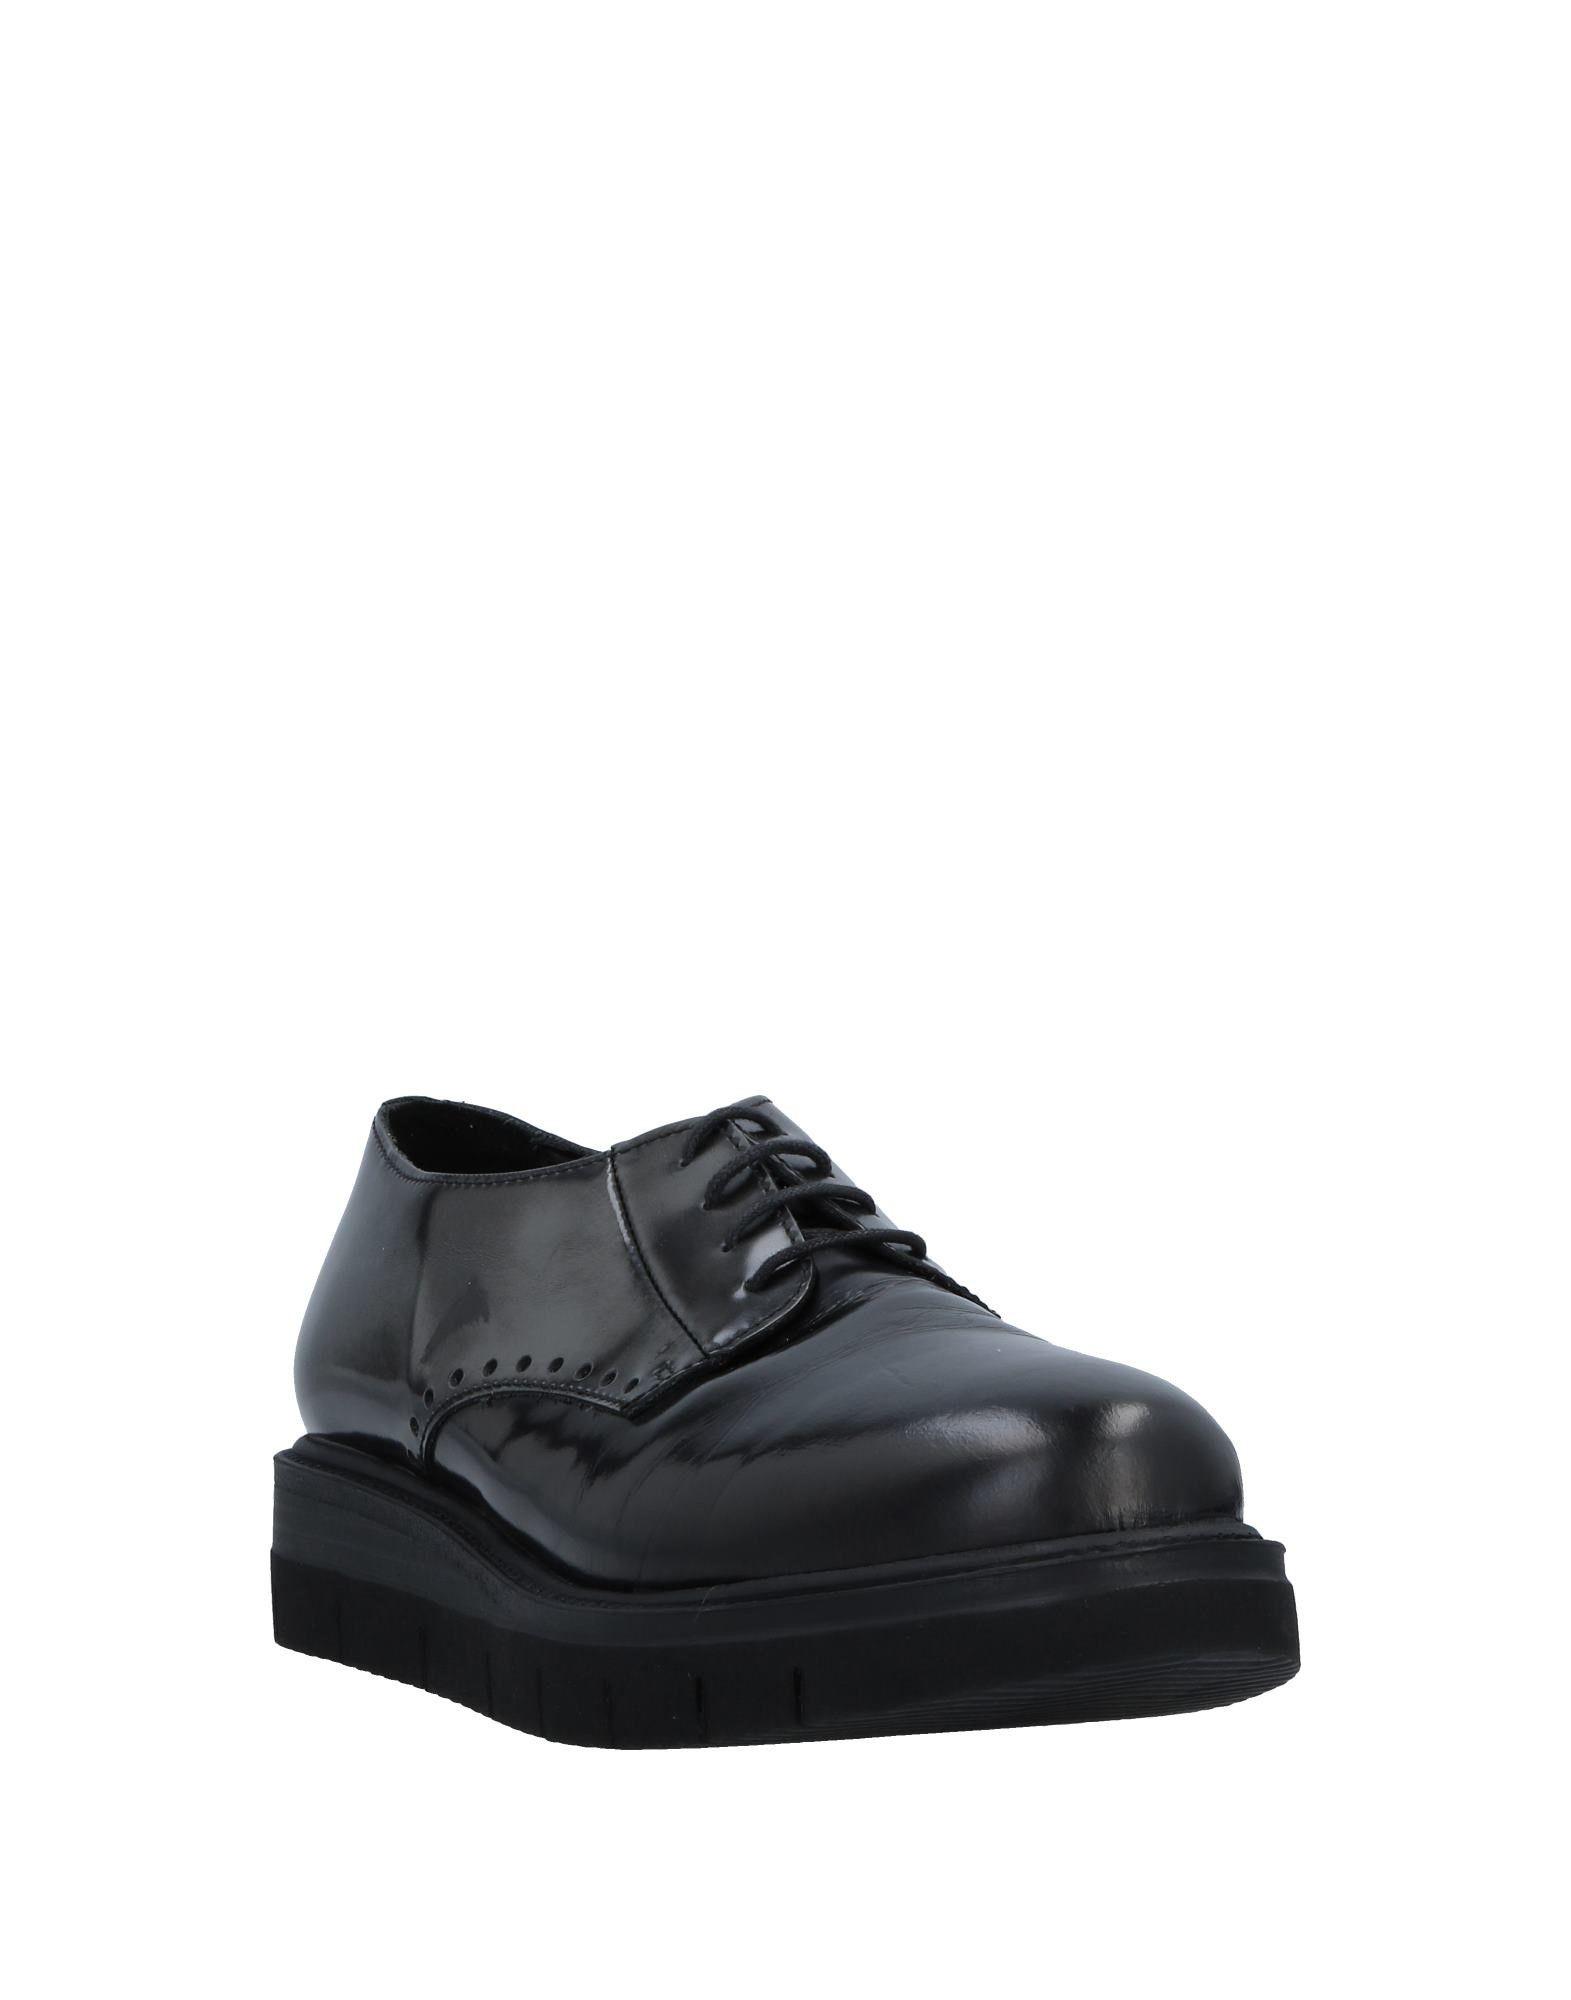 Lemaré Schnürschuhe beliebte Damen 11530642DG Gute Qualität beliebte Schnürschuhe Schuhe 616382